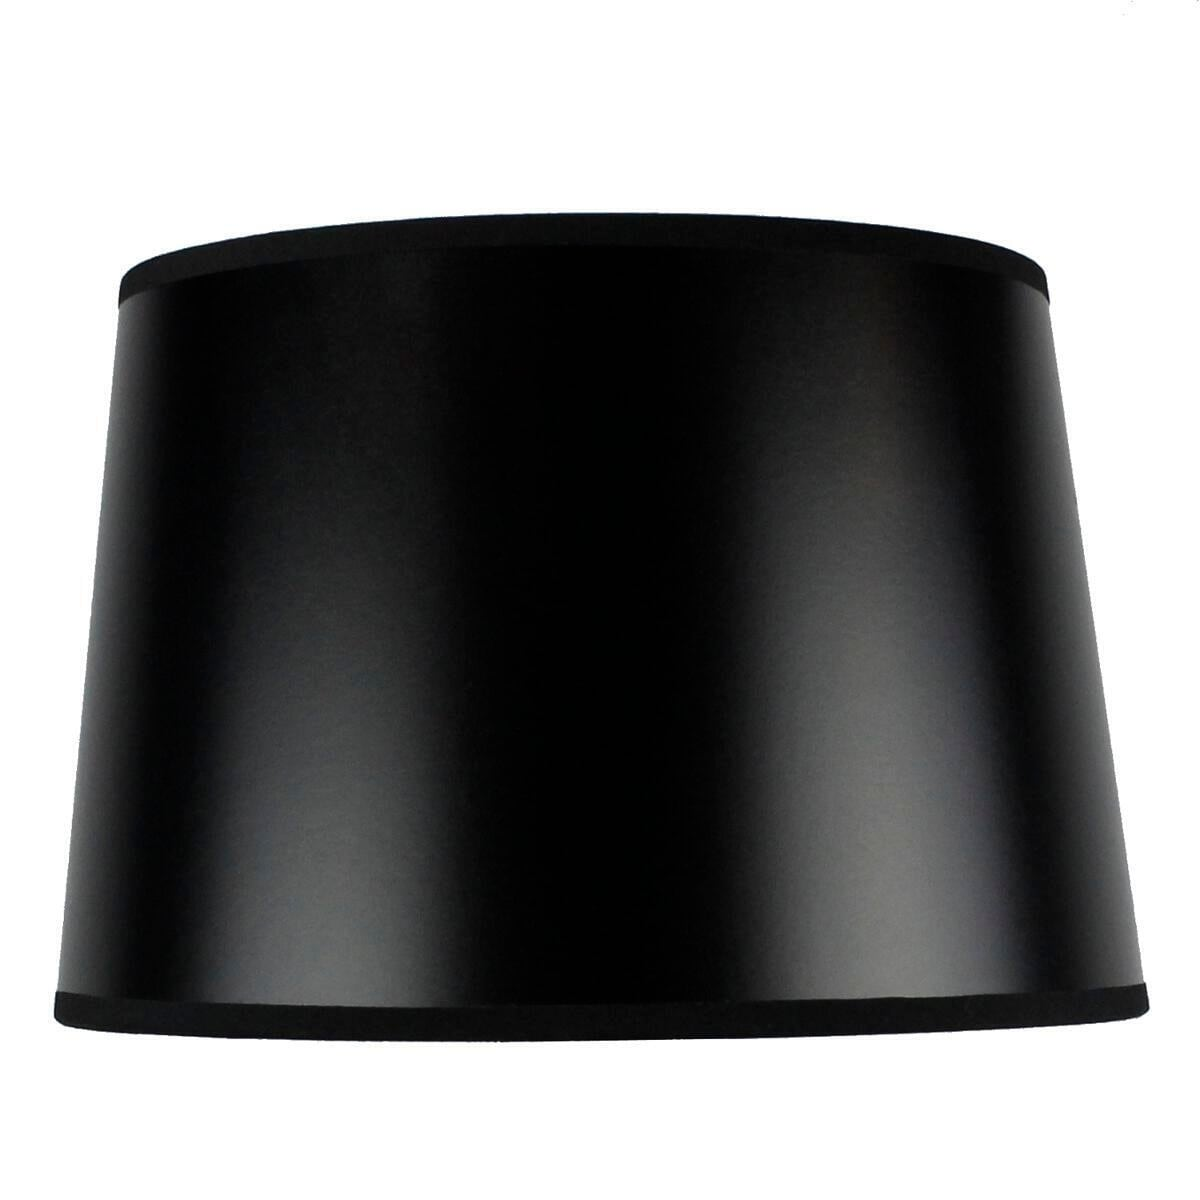 10x12x8 Slip Uno Fitter Hardback Shallow Drum Lamp Shade Black